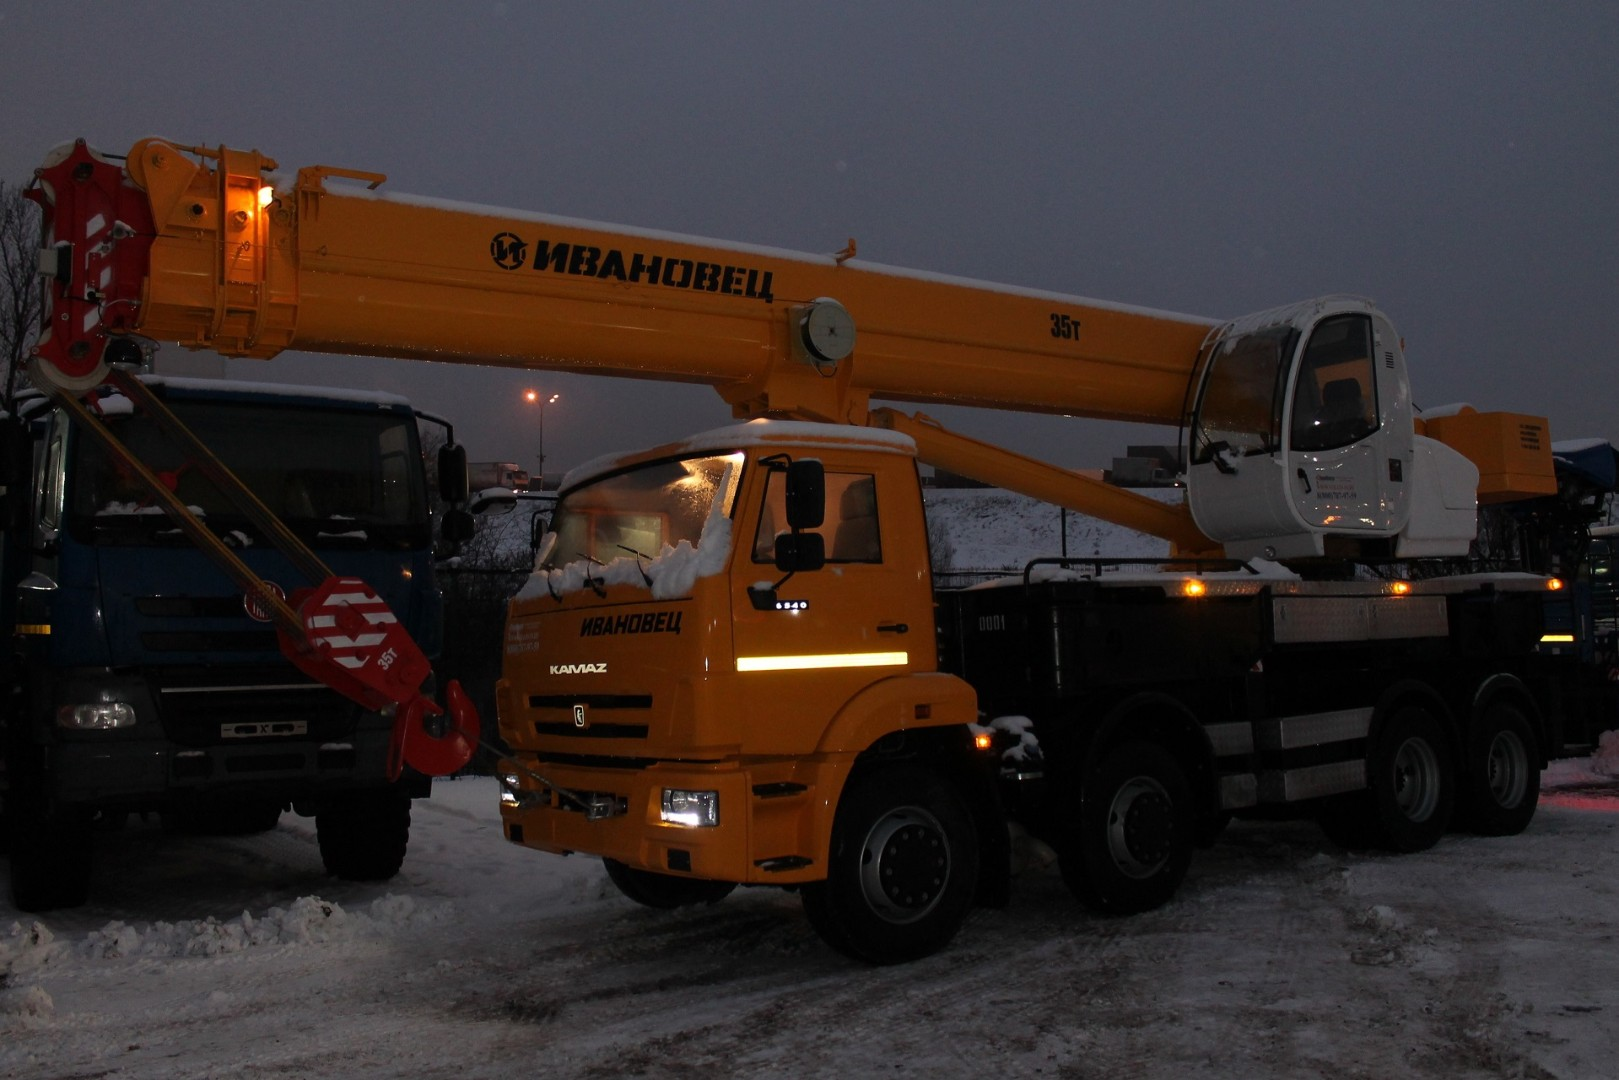 Автокран Ивановец КС-55735-6 грузоподъёмностью 35 тонн